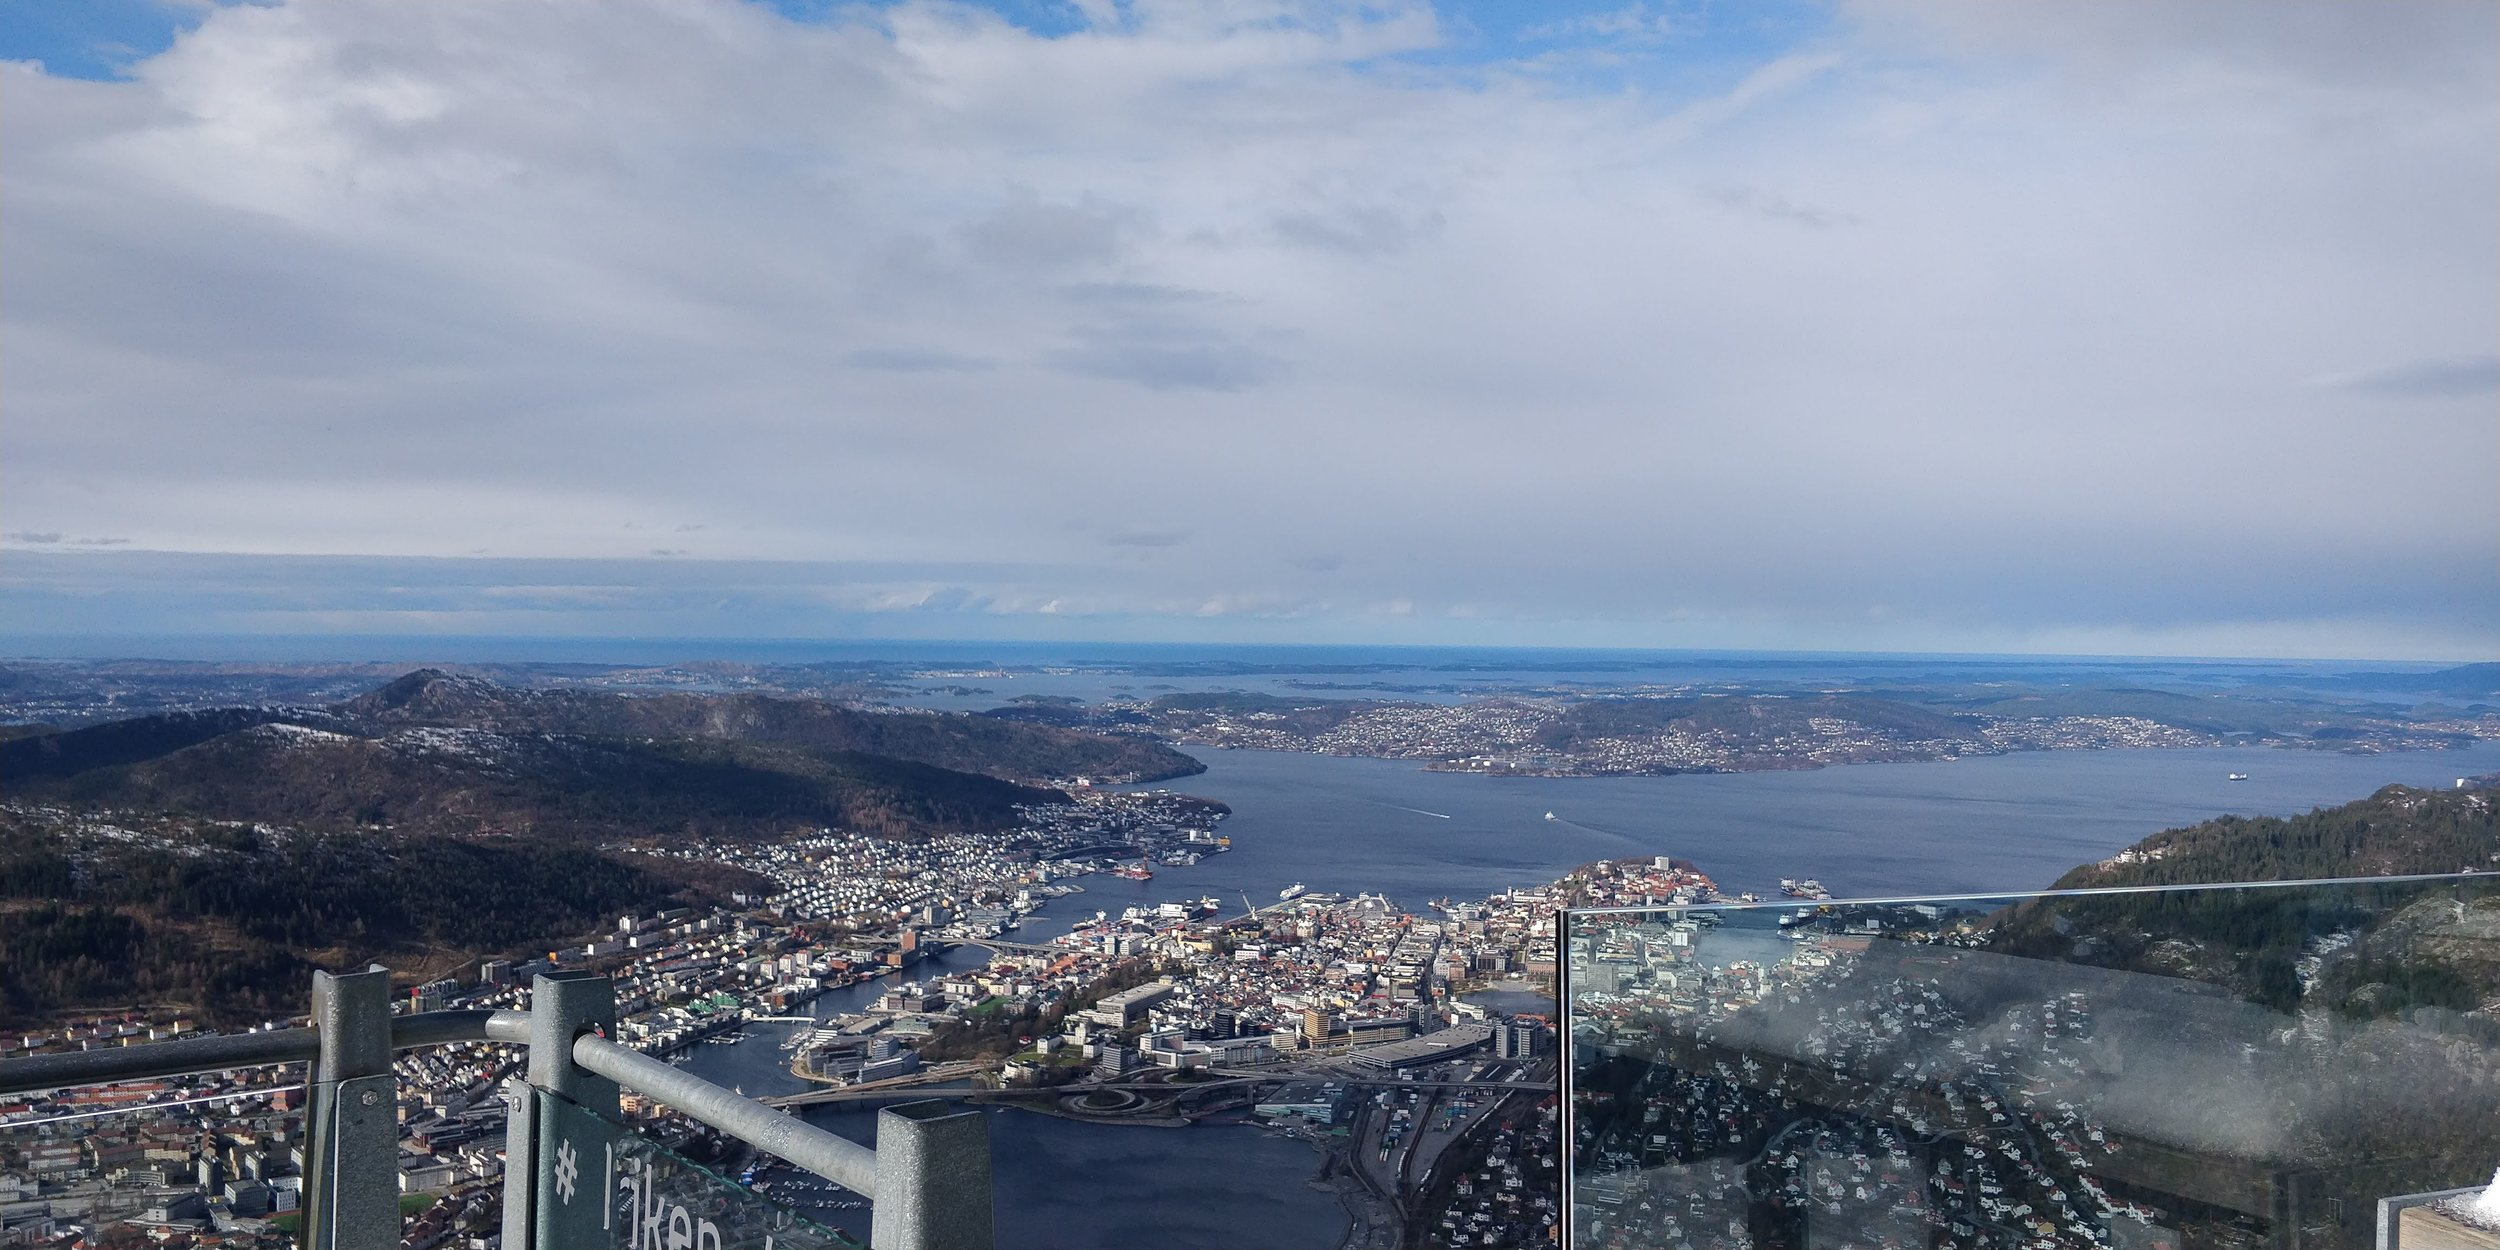 "Not a great photo with the glass, but here's a view from Ulriken! Ikkje eit særleg fantastisk bilete med glaset, men her er ein ""vy"" frå Ulriken!"